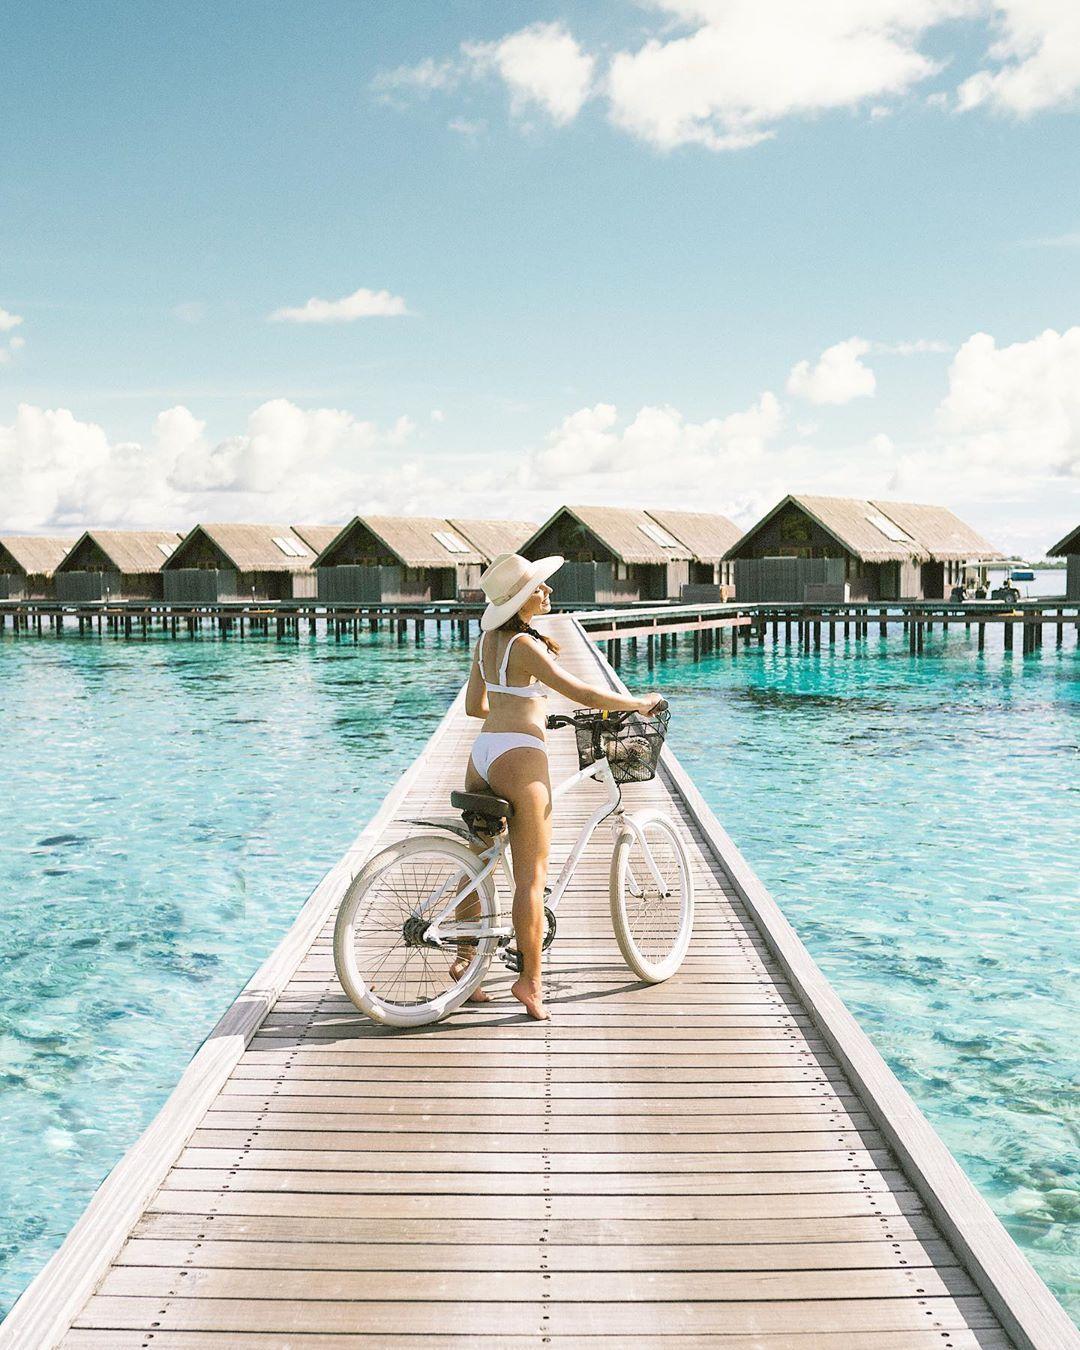 Shangri La Maldives Water Villa With Sabrina Diaries Adventuretravel Travelphotography And Maldives Water Villa Honeymoon Destination Ideas Romantic Places